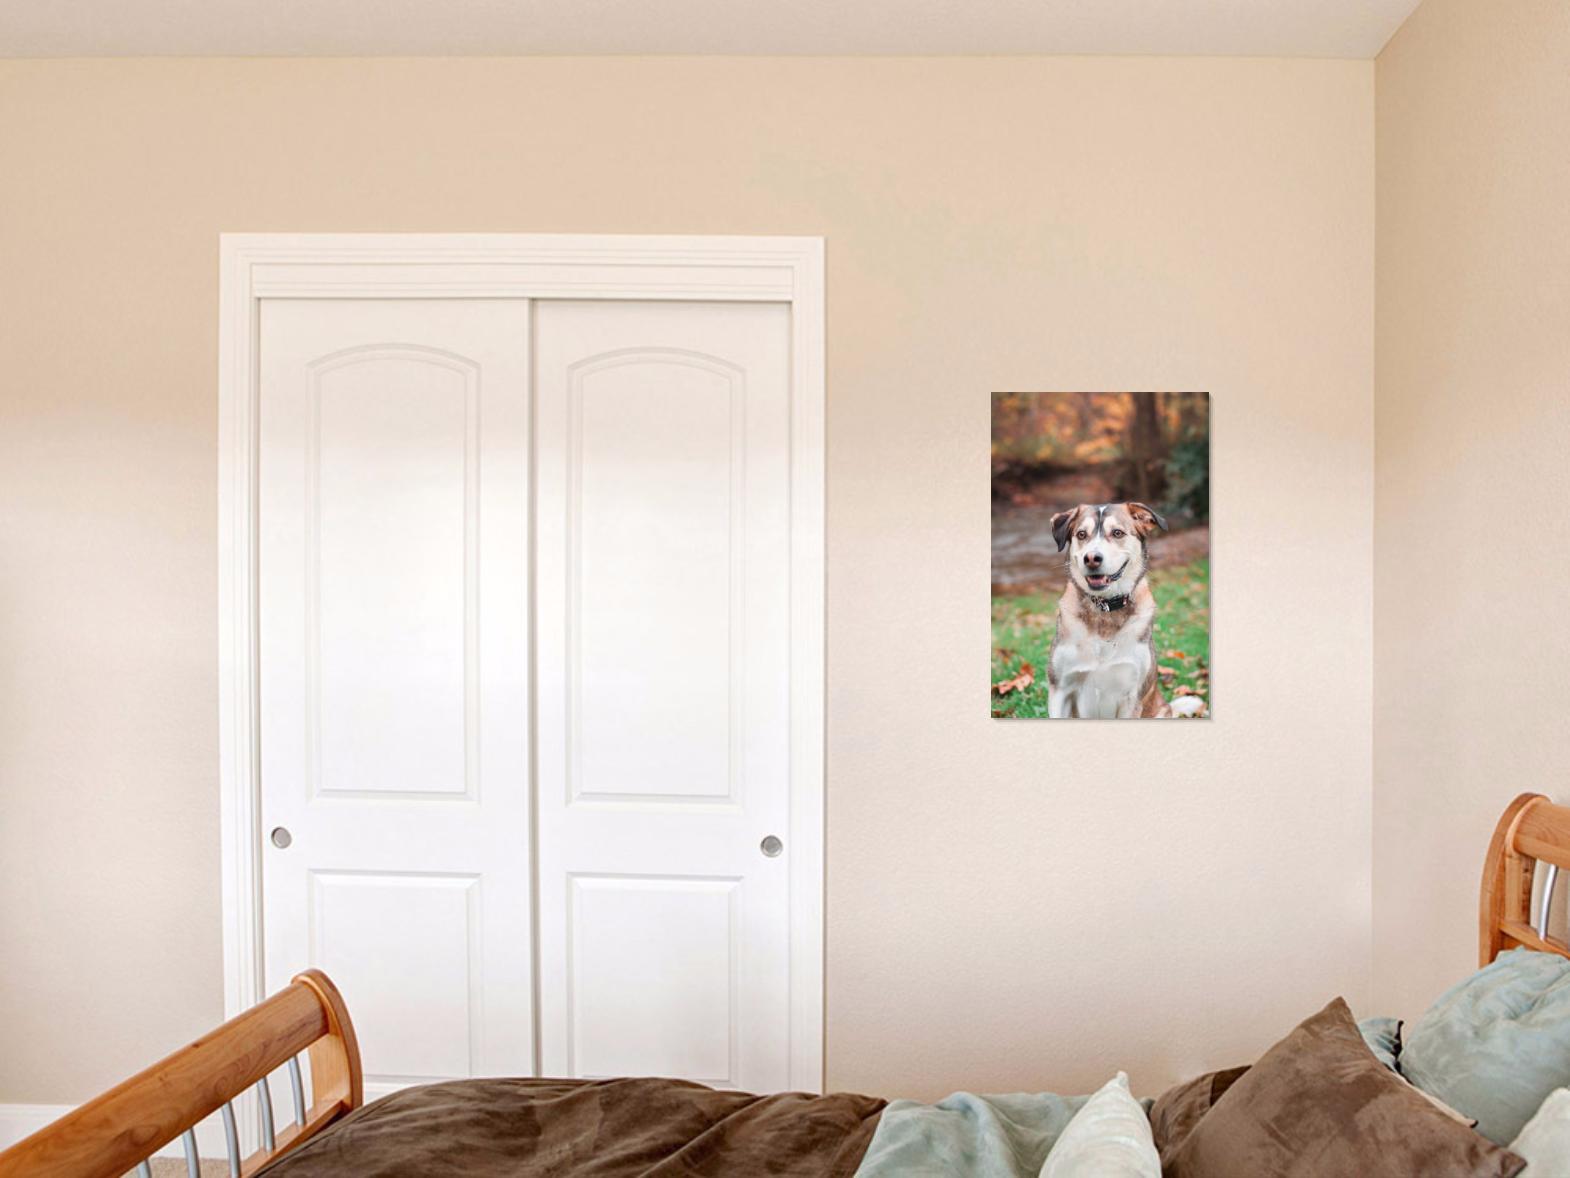 24x36 bedroom canvas